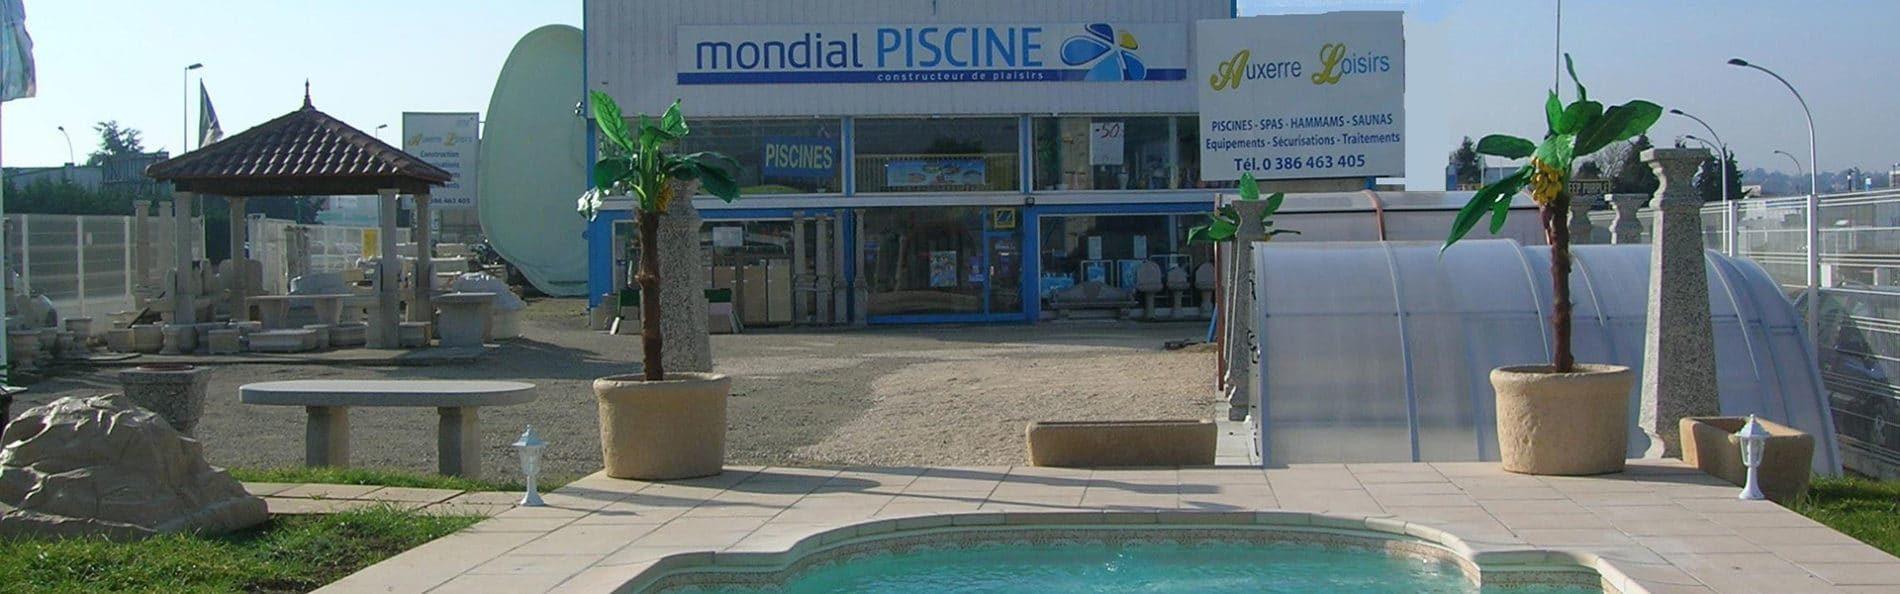 Auxerre Loisirs – Mondial Piscine